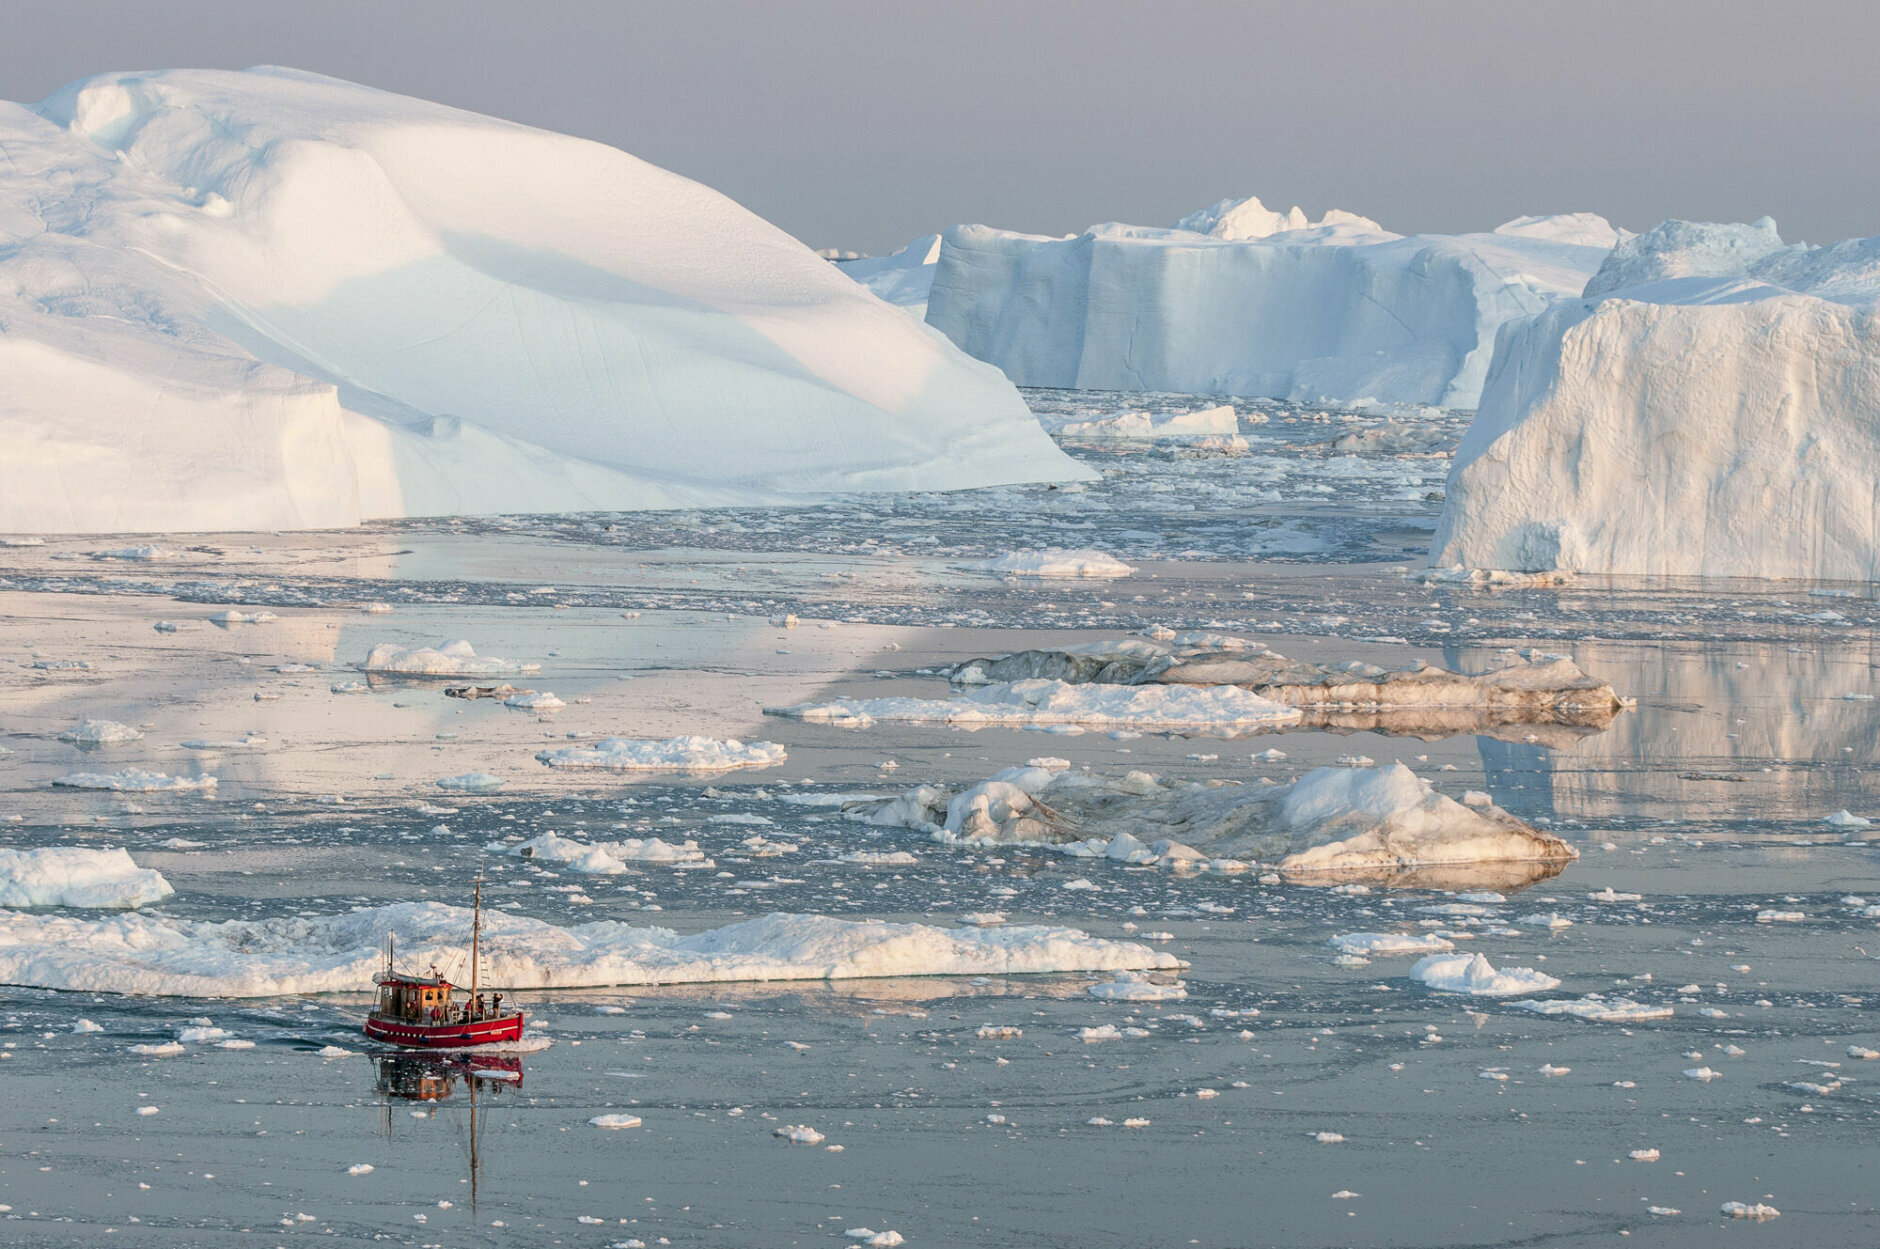 Small boat, Icebergs, Ilulissat, Greenland